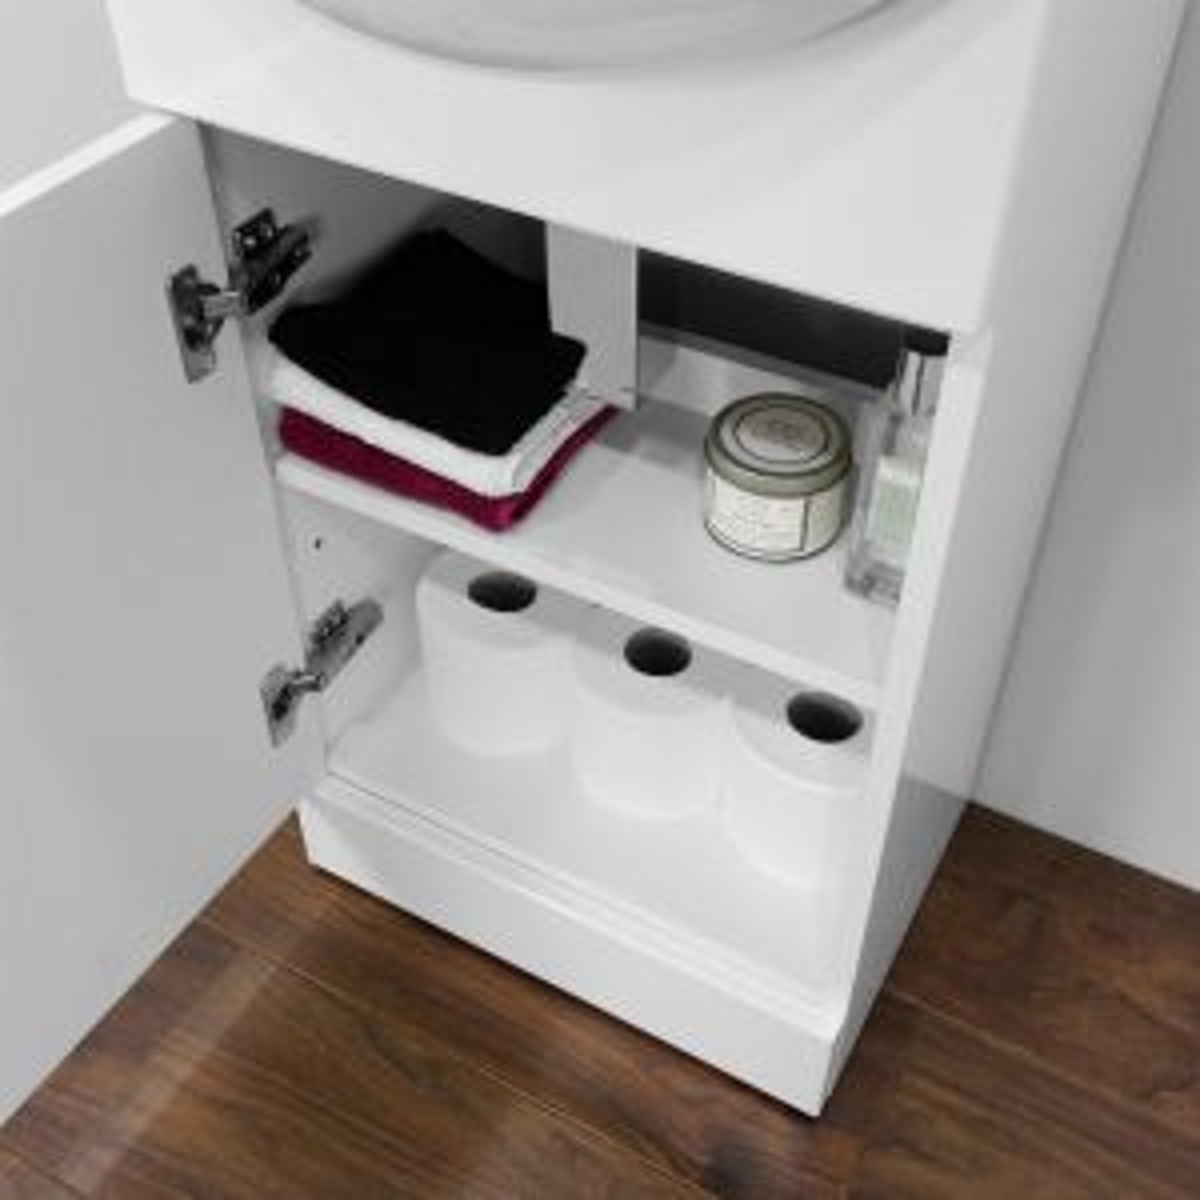 Premier High Gloss White Vanity Unit with Standard Basin 450mm - Storage